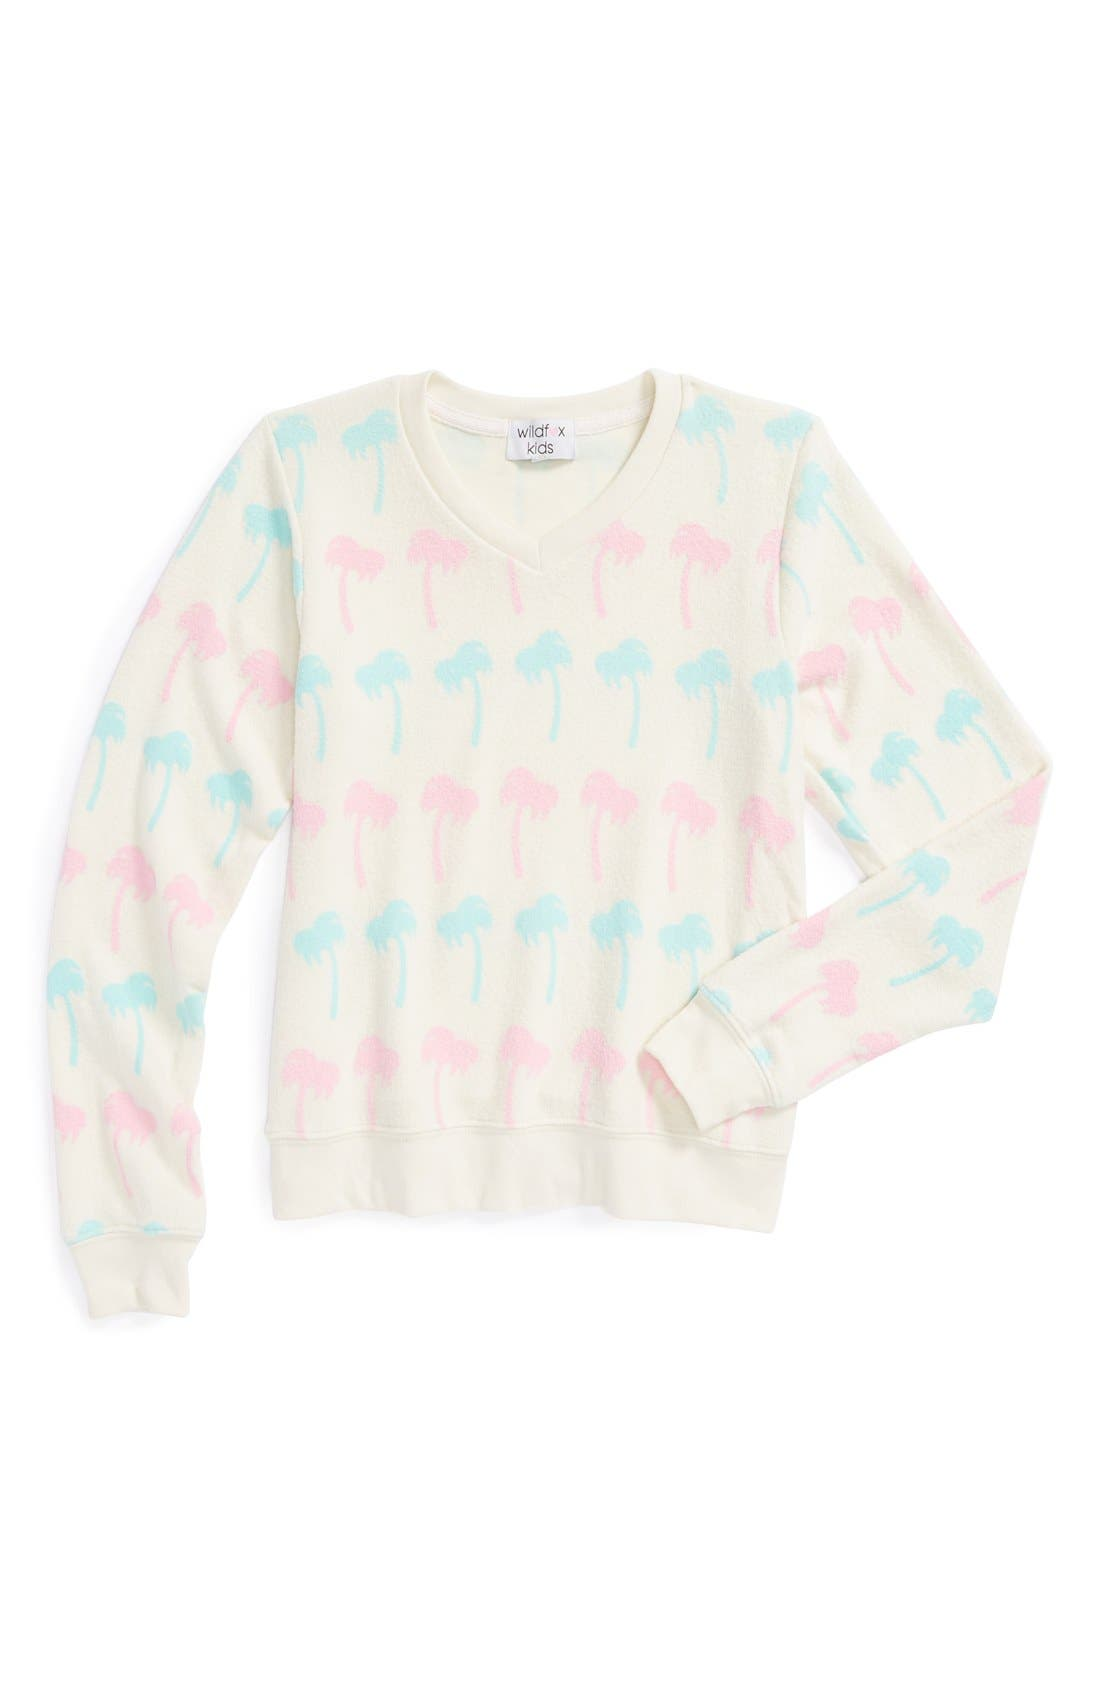 Main Image - Wildfox 'Pastel Palms' V-Neck Sweatshirt (Big Girls)